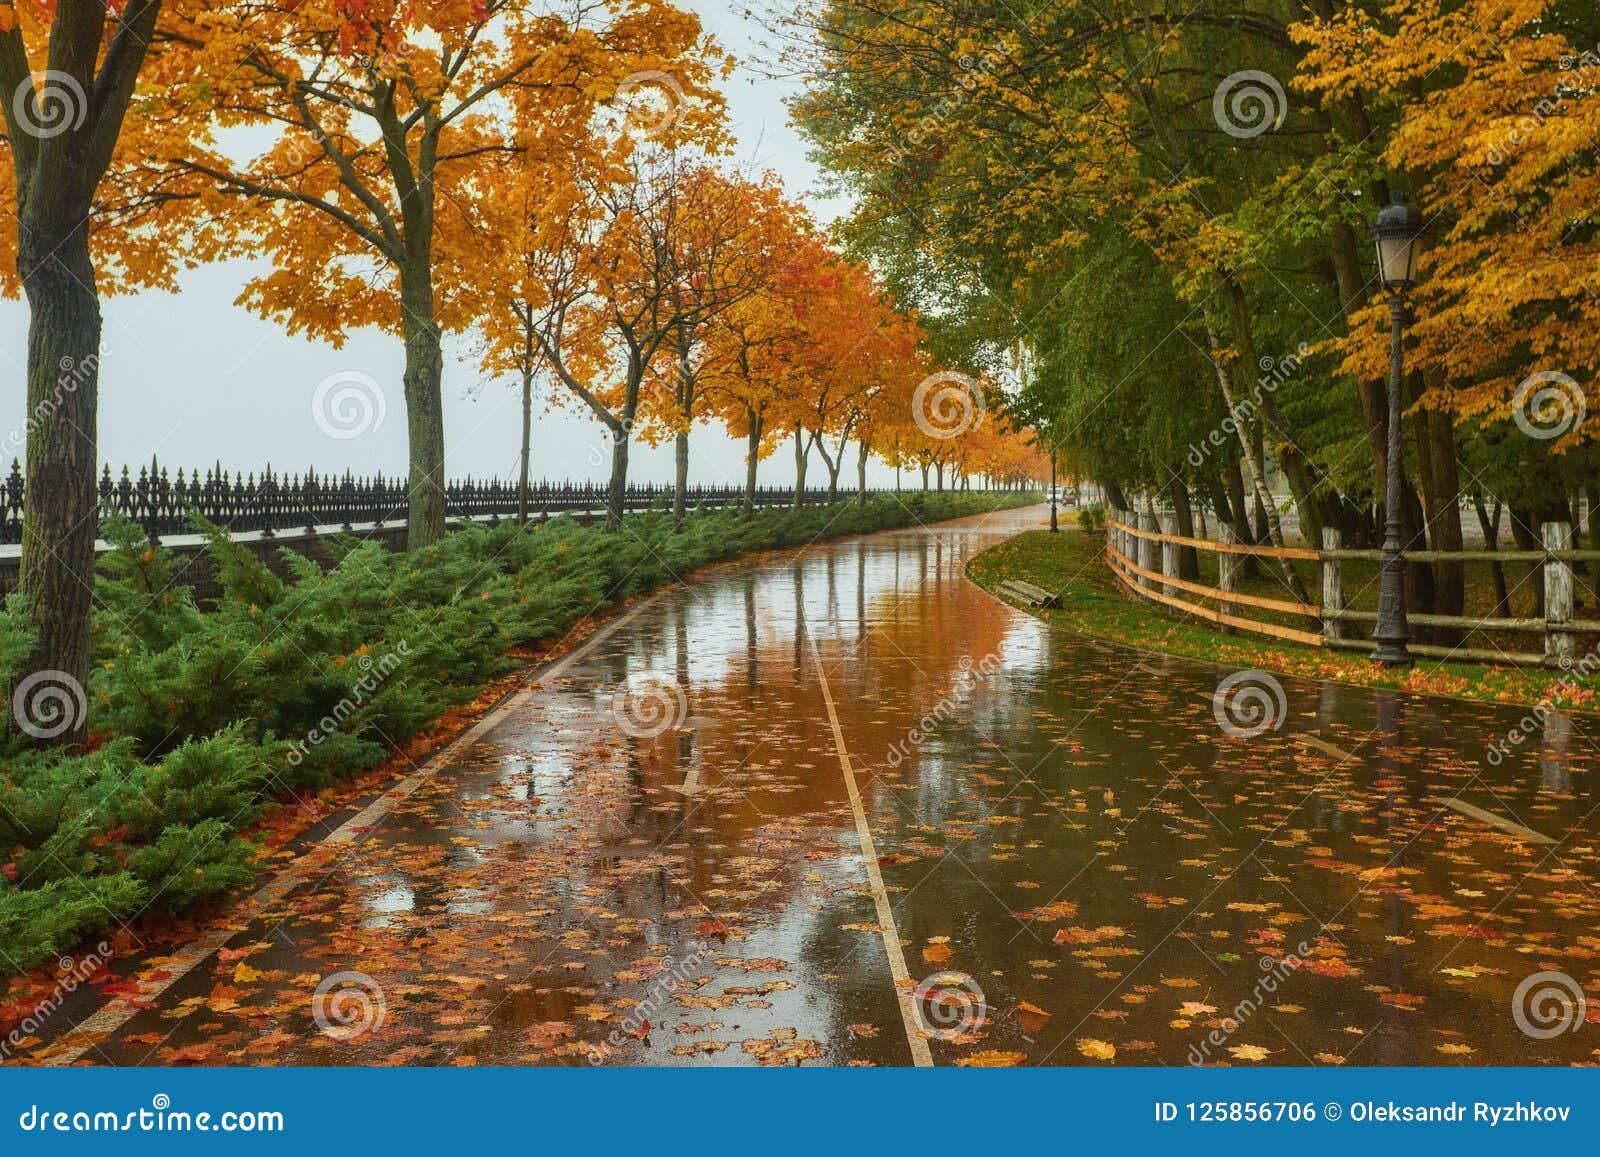 Autumn Park Rainy Background Autumn Landscape Background Rain